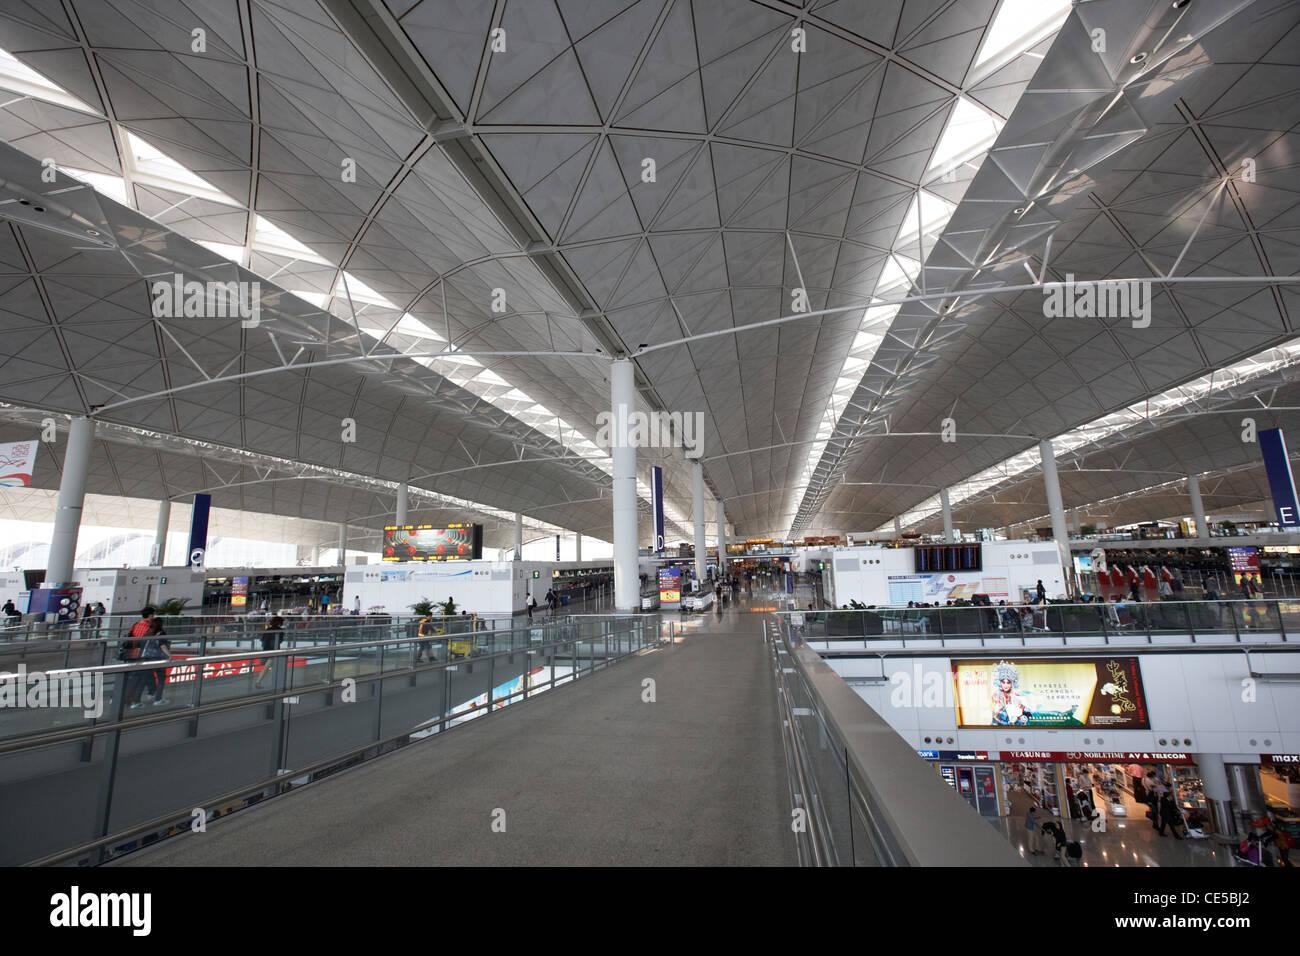 roof of hong kong international airport chek lap kok hksar china asia - Stock Image